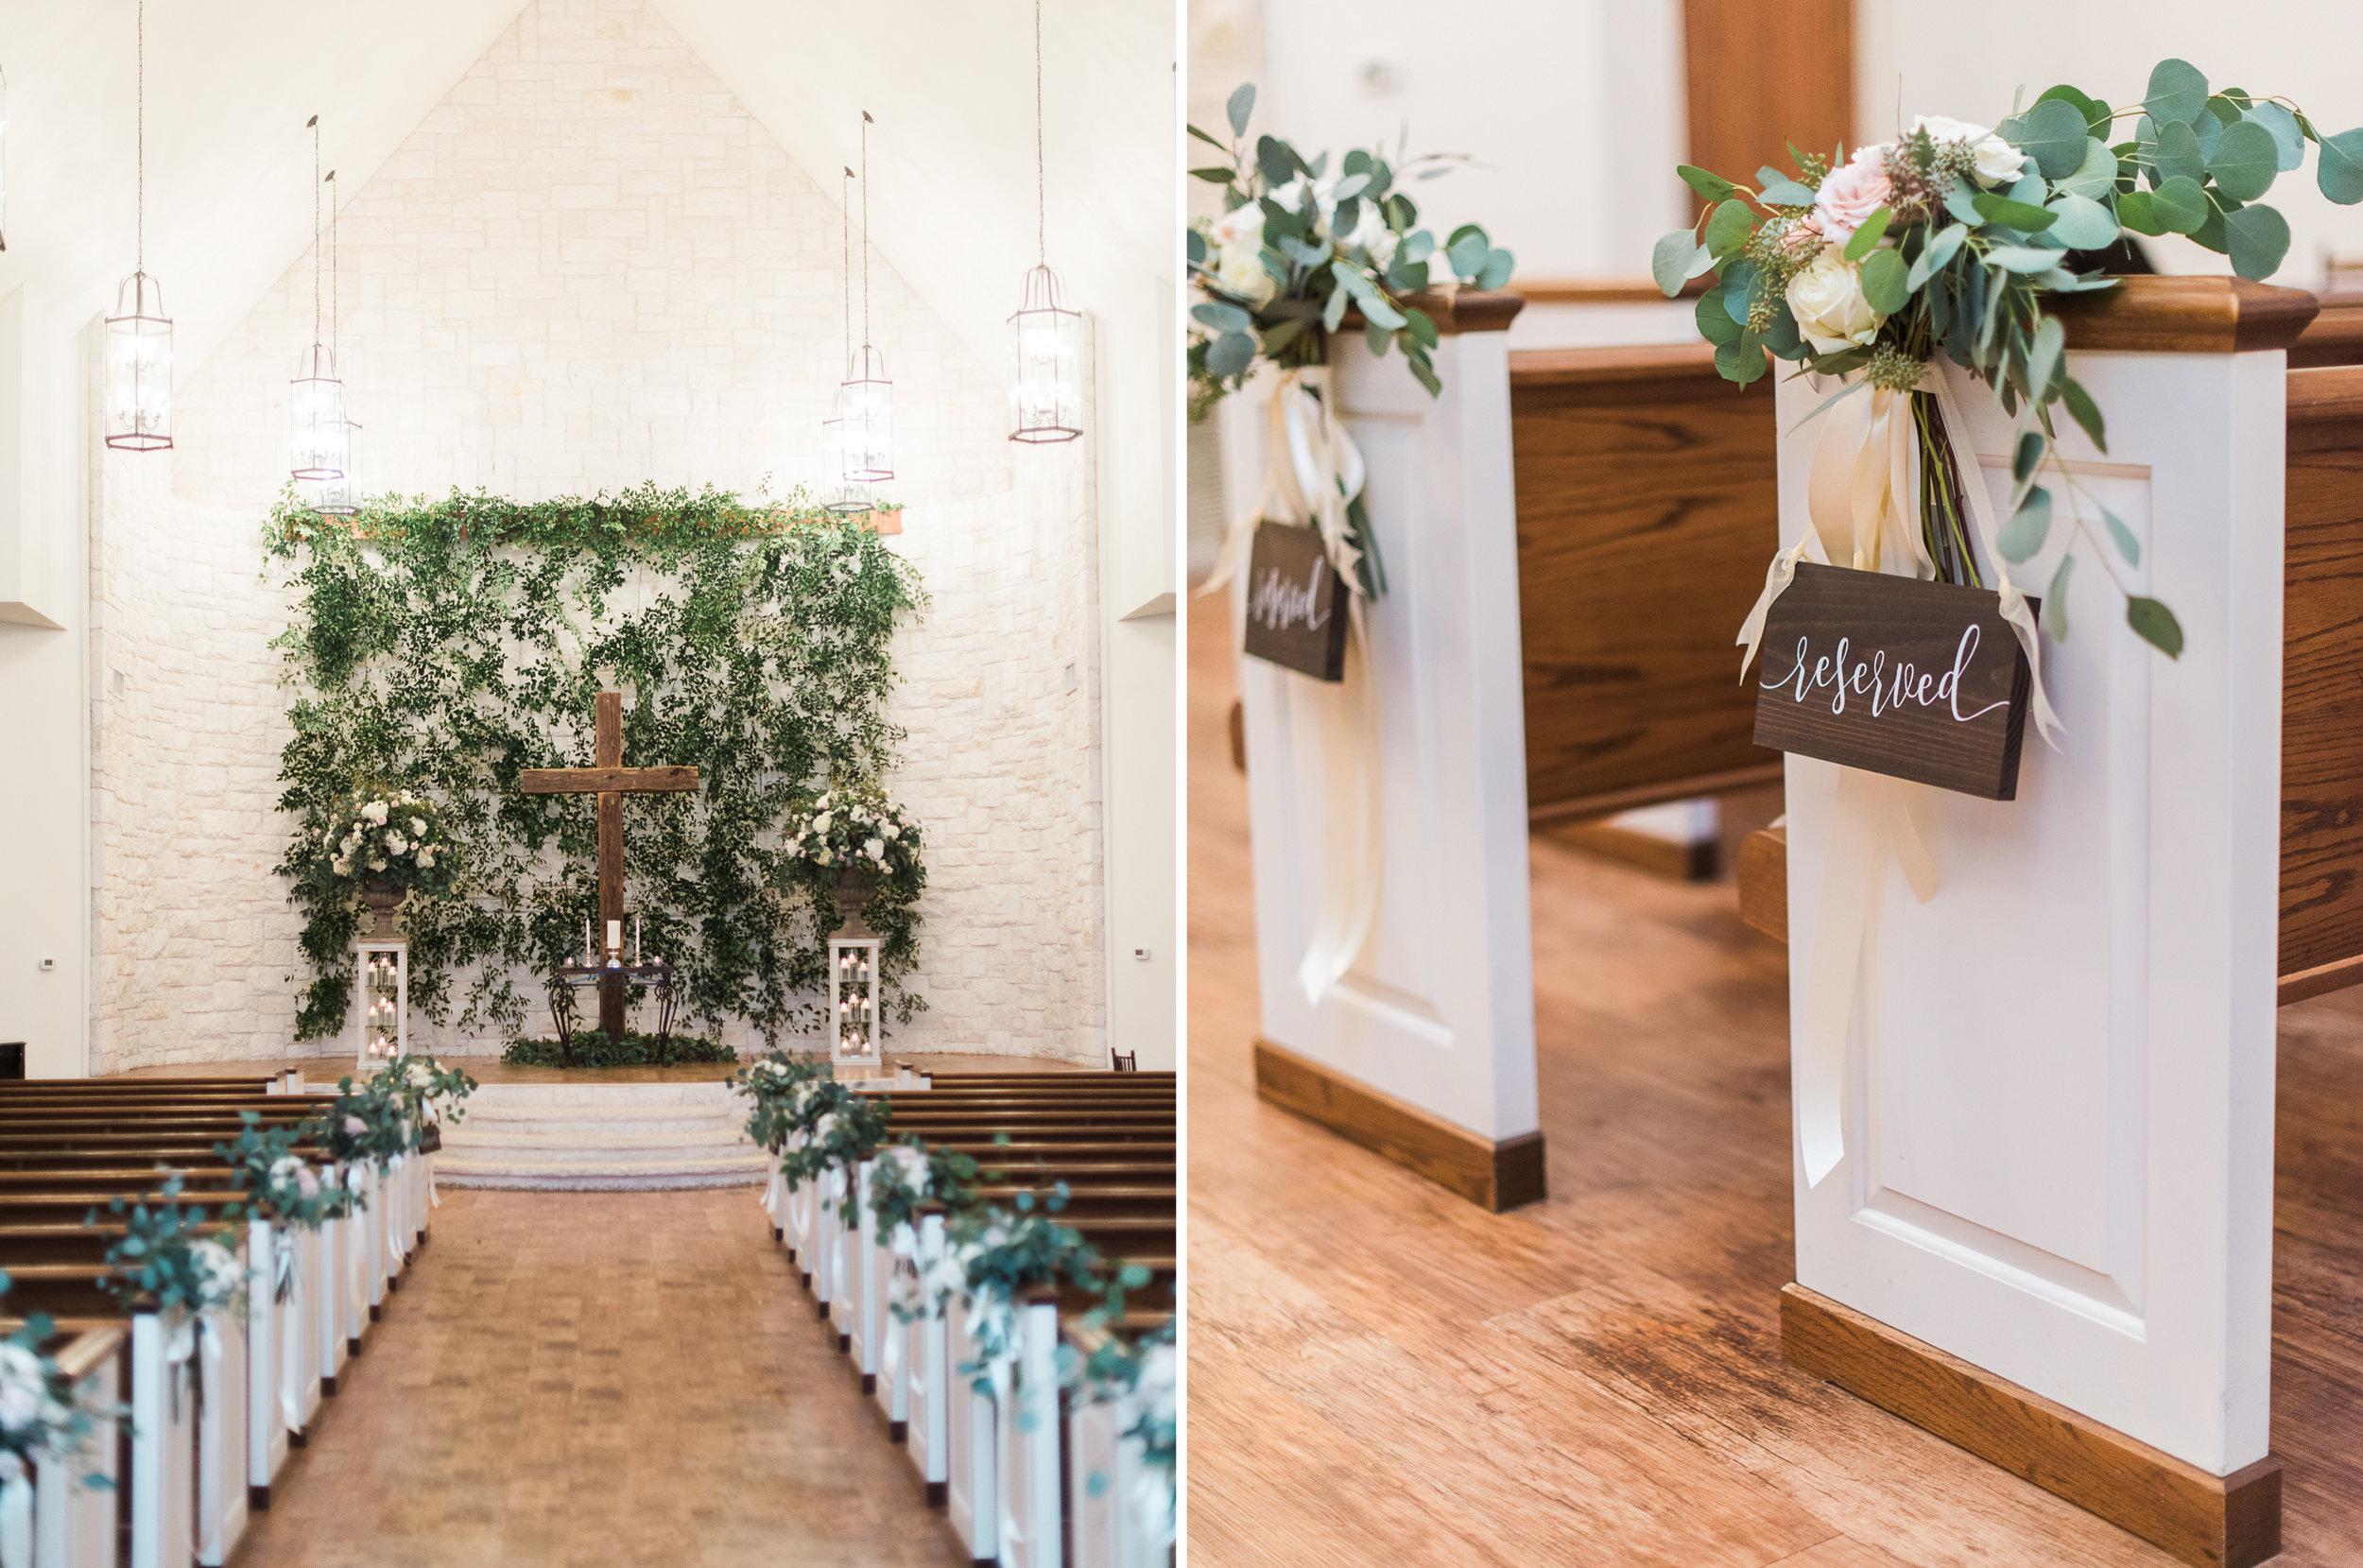 Briscoe-Manor-Houston-Wedding-Photographer-Modern-Luxury-Weddings-Dana-Fernandez-Photograpy-Fine-Art-Photographer-Houston-Film-Destination-PNW-Wedding-Photographer-103.jpg